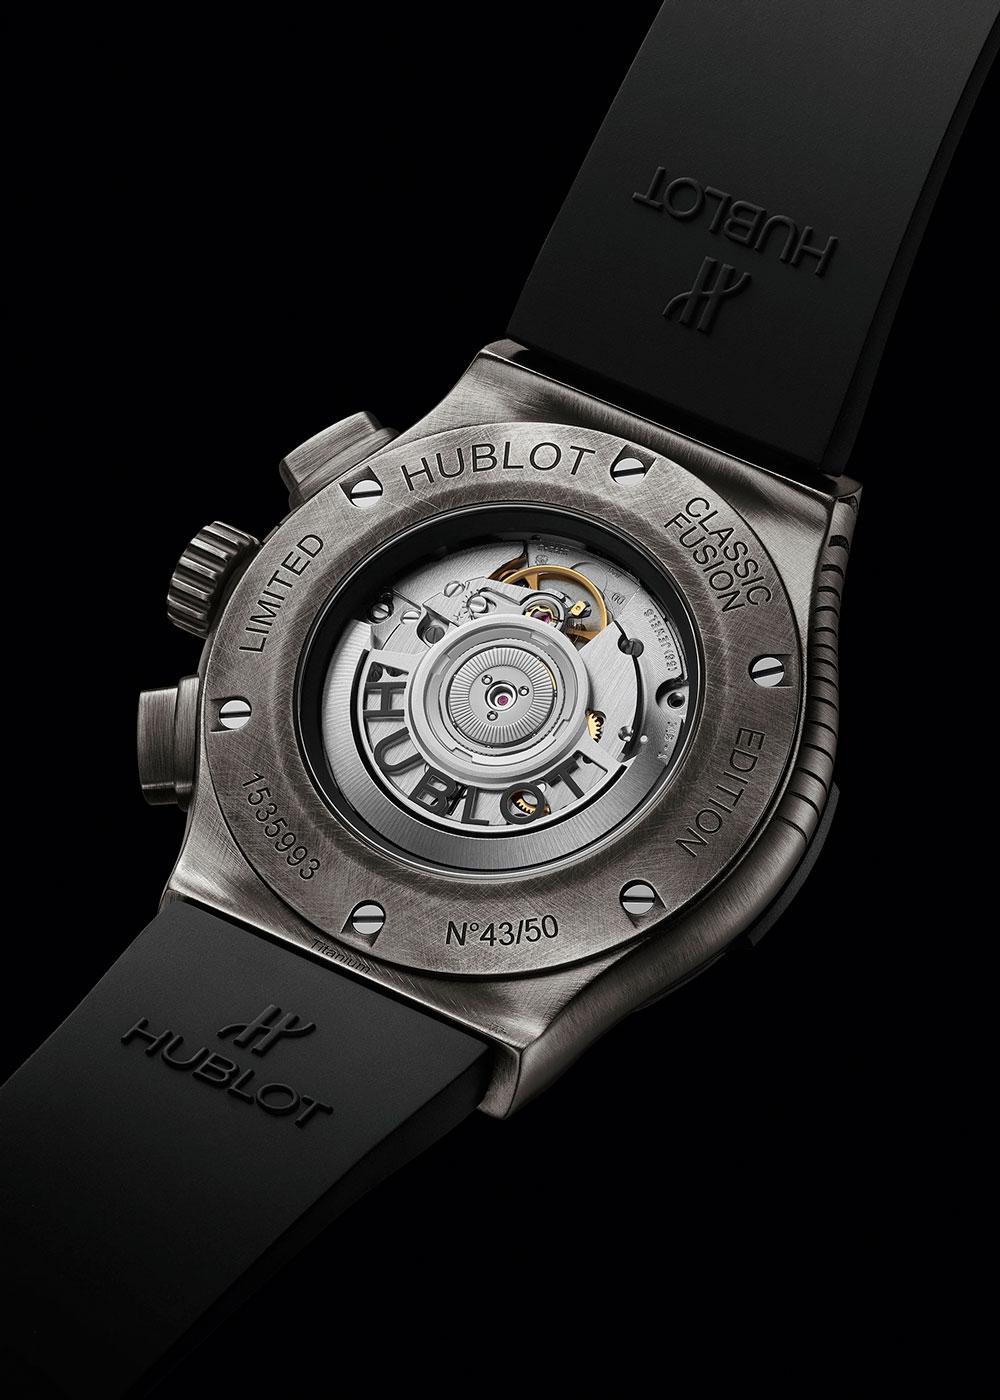 Calibre del Hublot Classic Fusion Chronograph Shepard Fairey